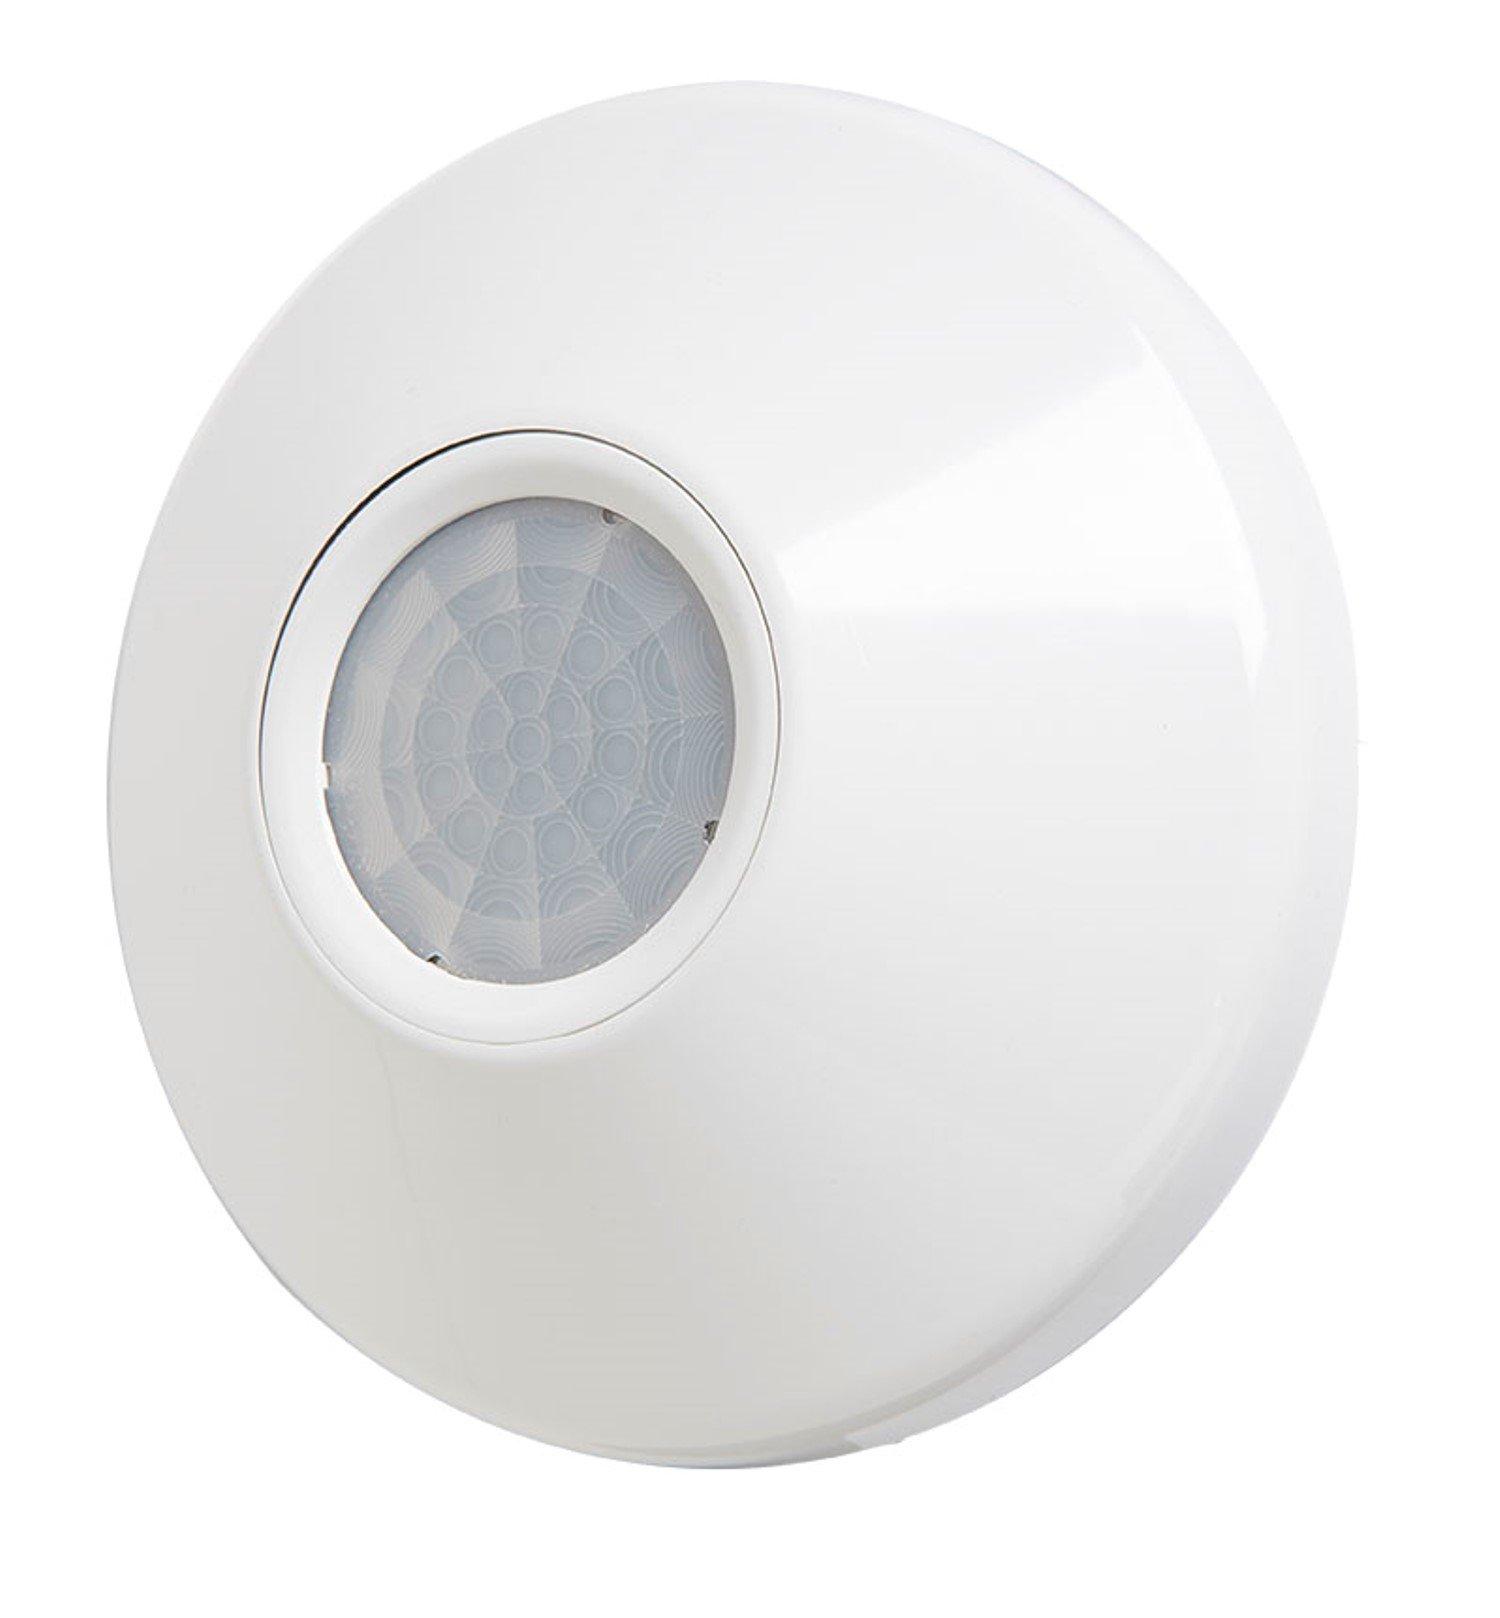 Sensor Switch CMR 6 High Bay, Passive Infrared Ceiling Mount Occupancy Sensor, White